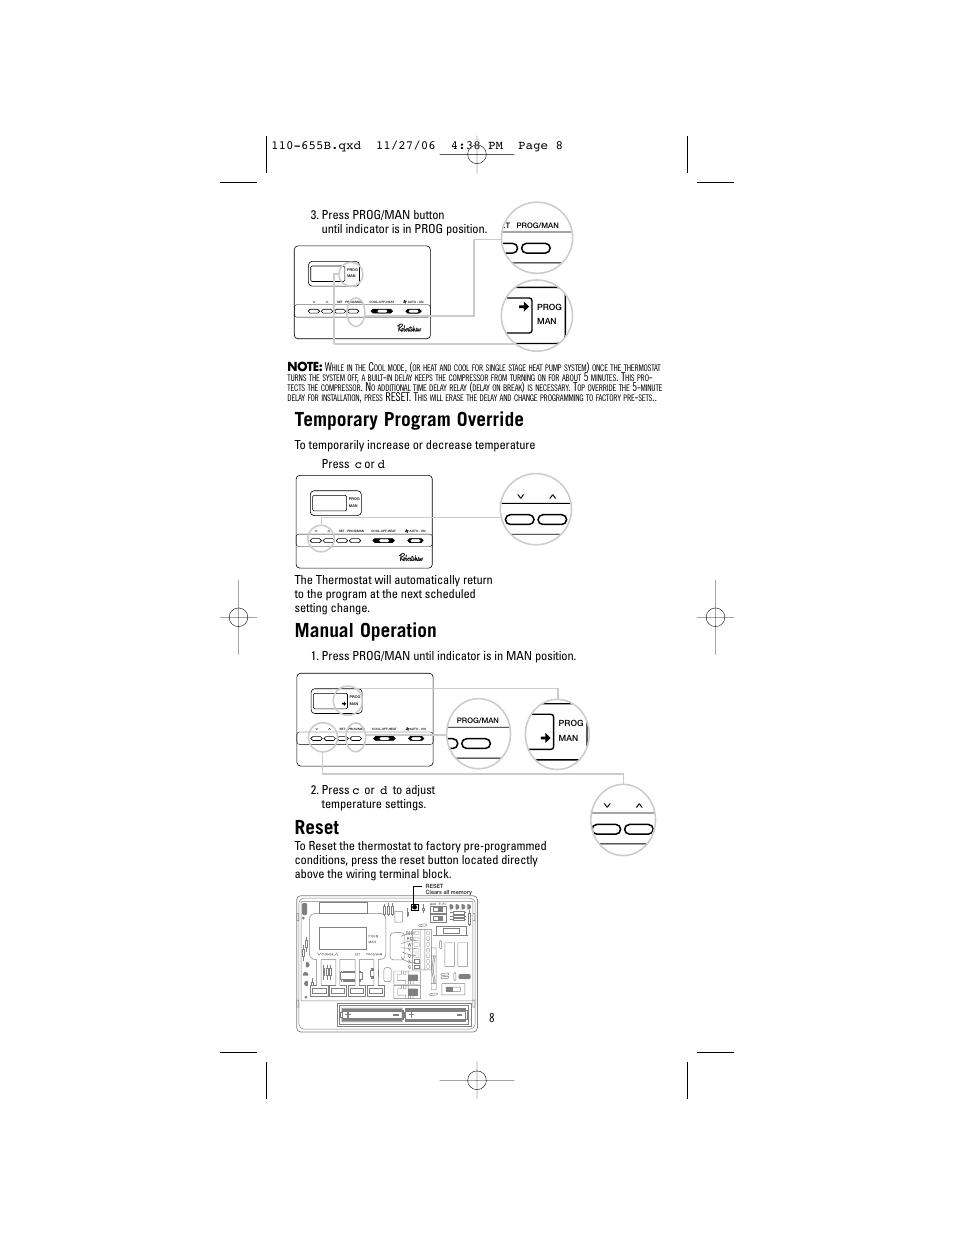 Robertshaw Thermostat 9610 Wiring Diagram Manual Of Maple Chase Emerson Rh Neckcream Co Temporary Program Override Operation Reset Manualsdir Com